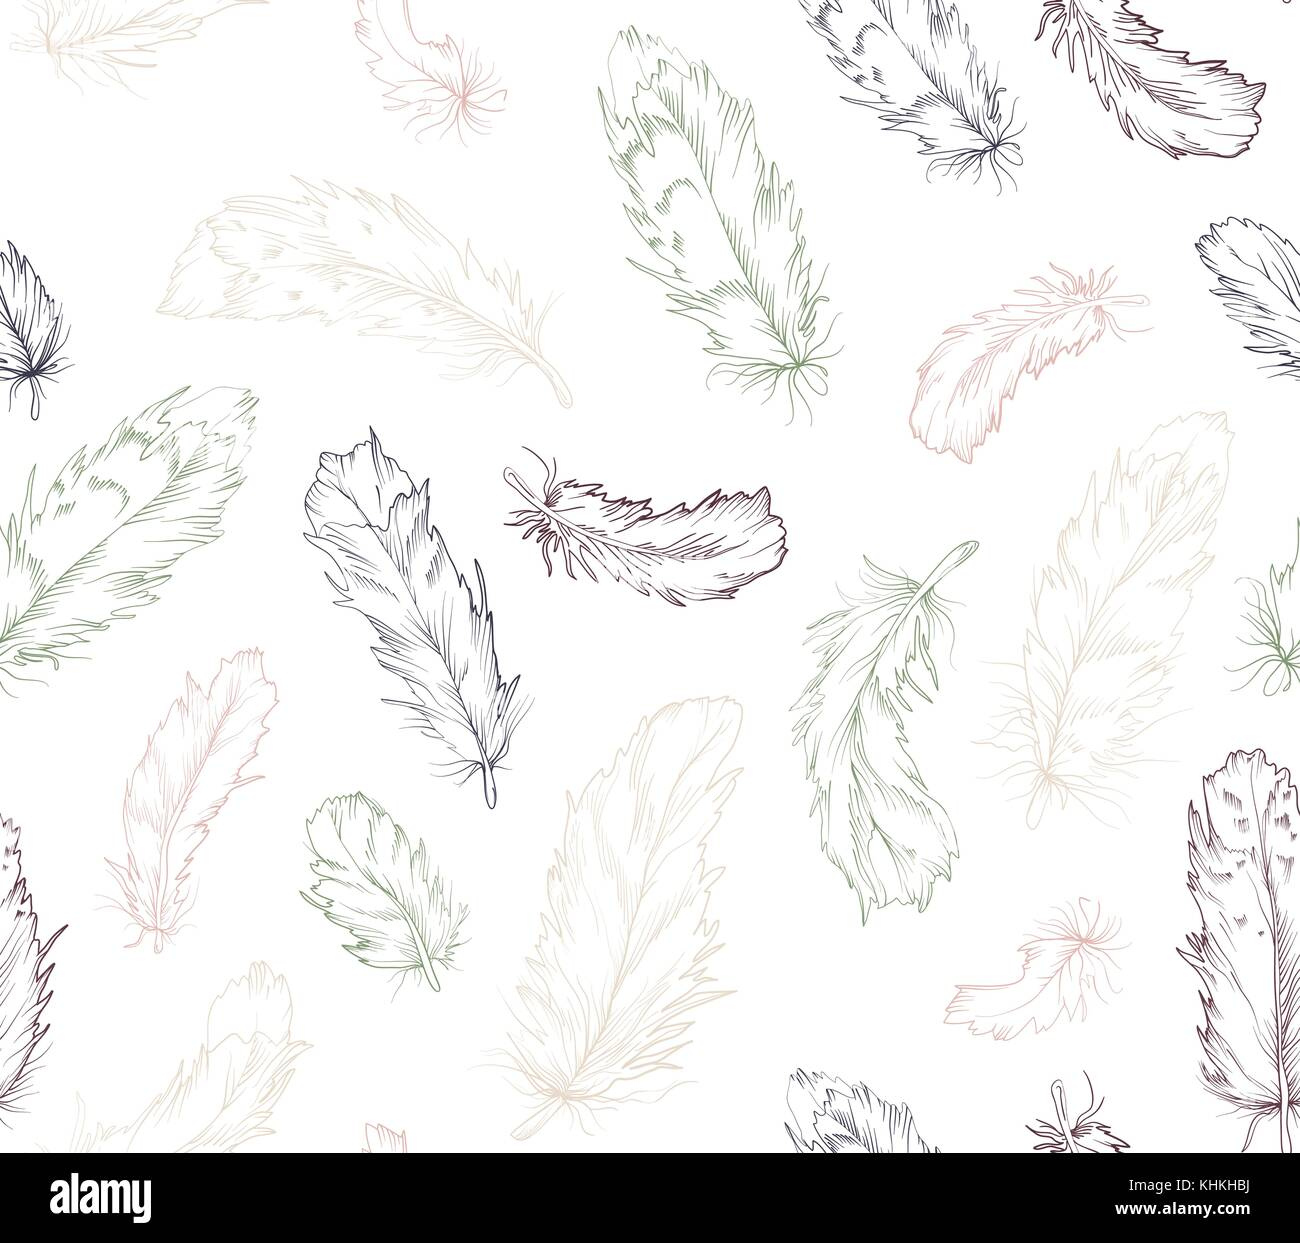 Grün, Marine, Hellrosa Farbe Lineare Pen Textur In Boho Style Für Strenge  Innere Tapeten, Textilien T Shirt Design Pa